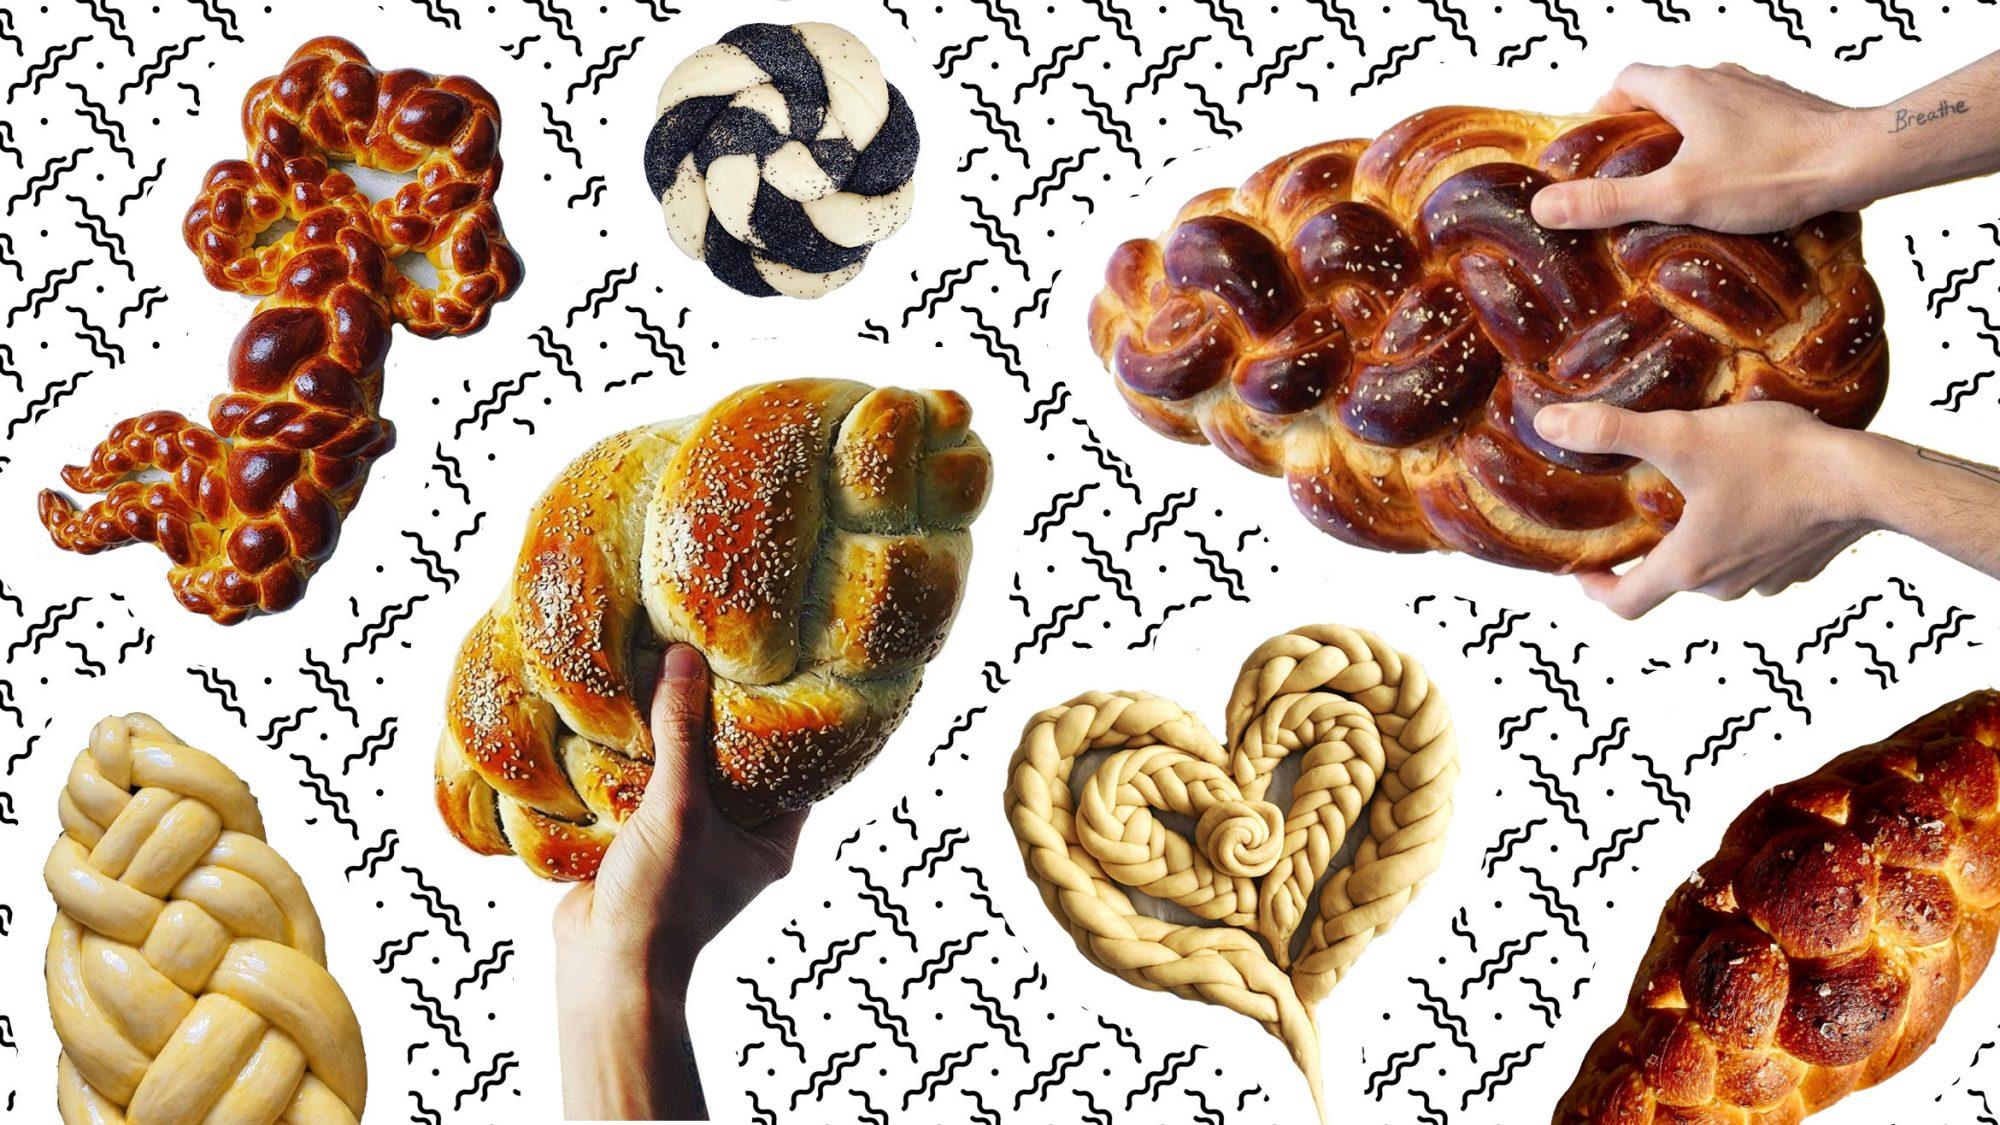 Article-Internet-Challah-Recipe-Instagram-Nomad-Bakery-Challah-Artist